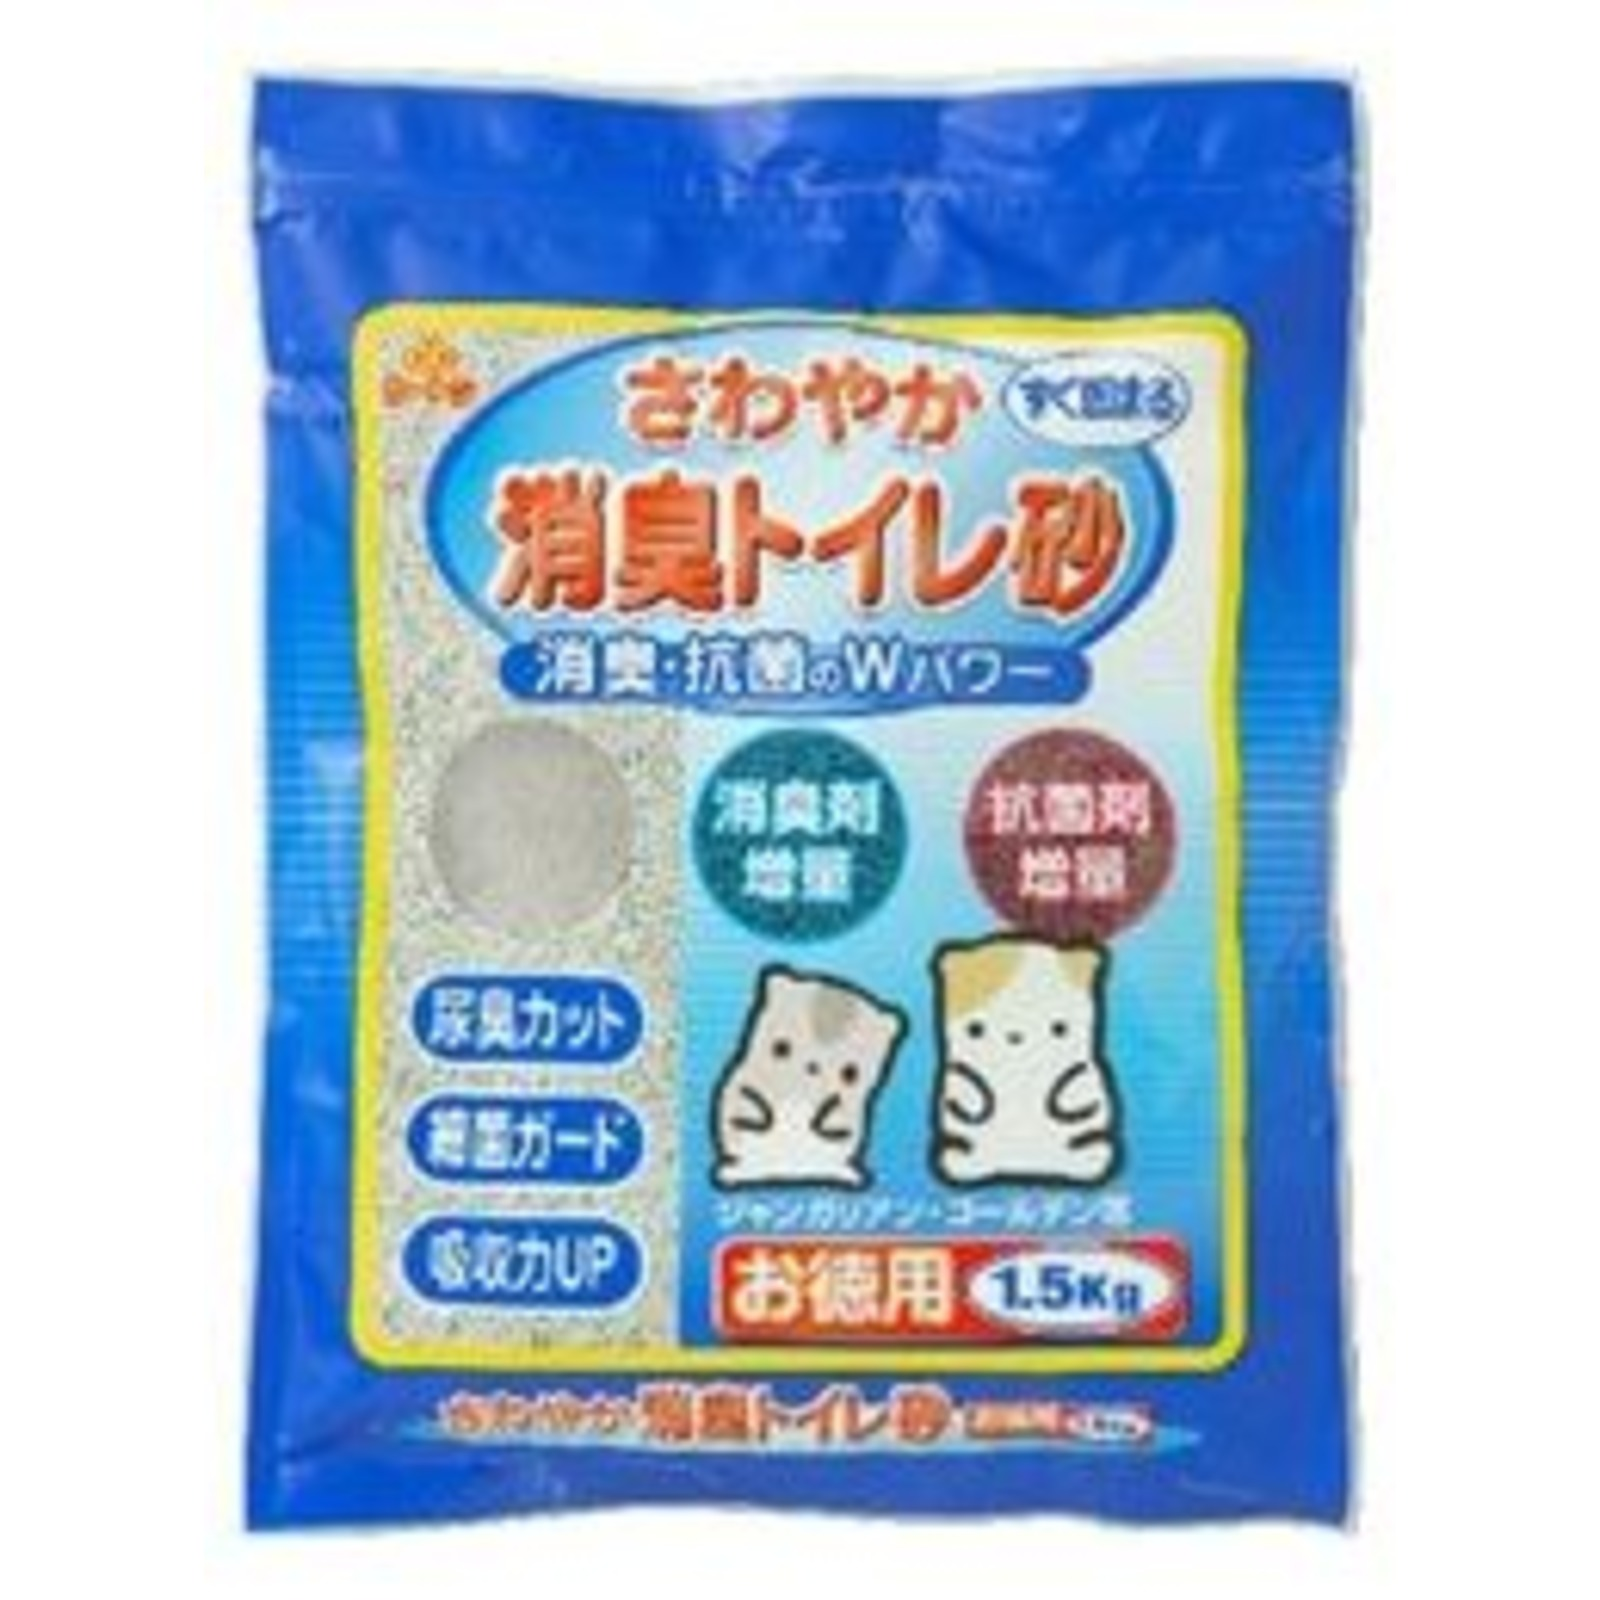 Gex Deodorant Litter Sand